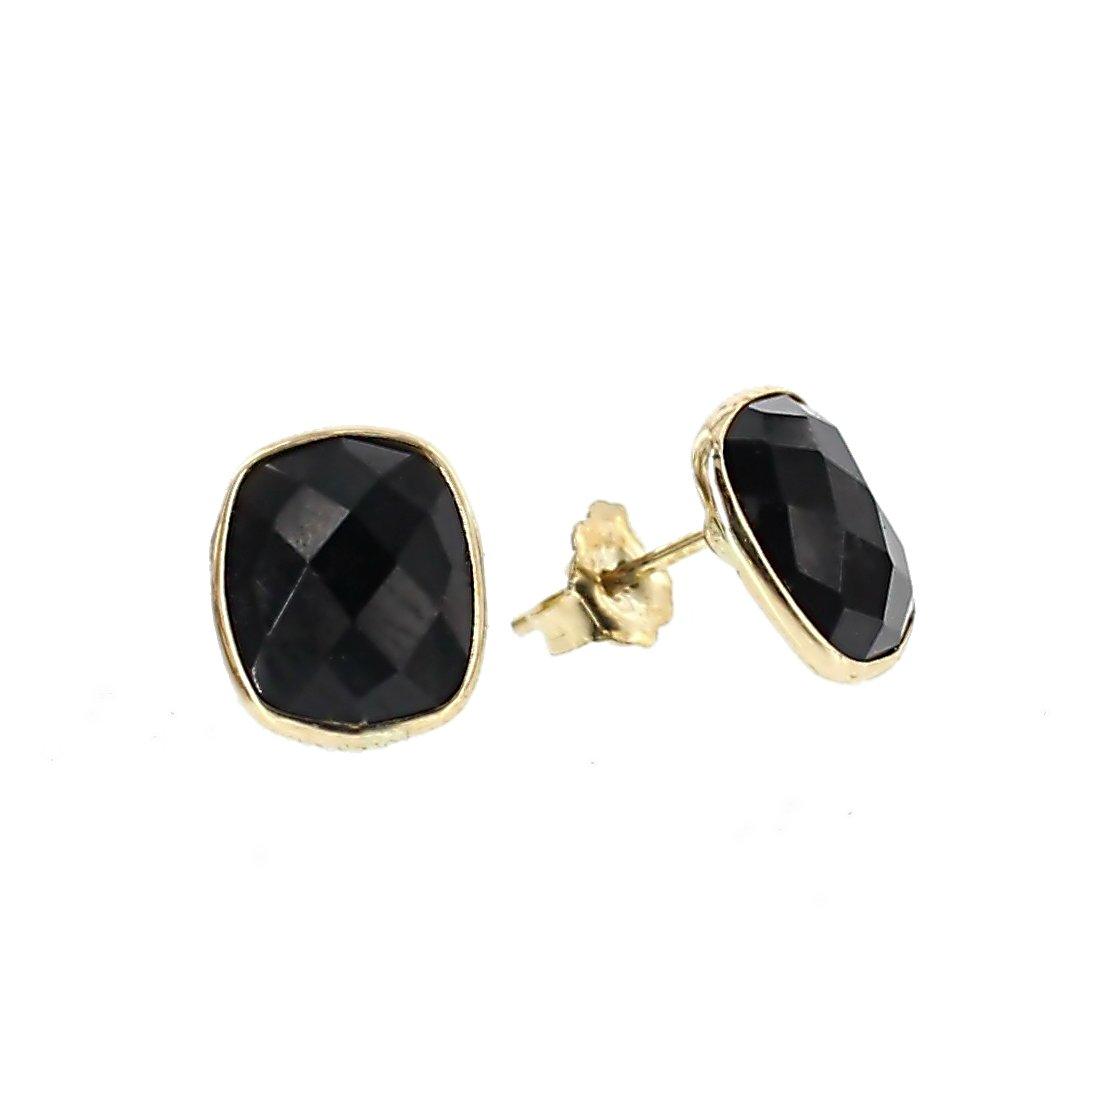 14K Yellow Gold Stud Earrings With Cushion Cut Black Onyx Gemstones